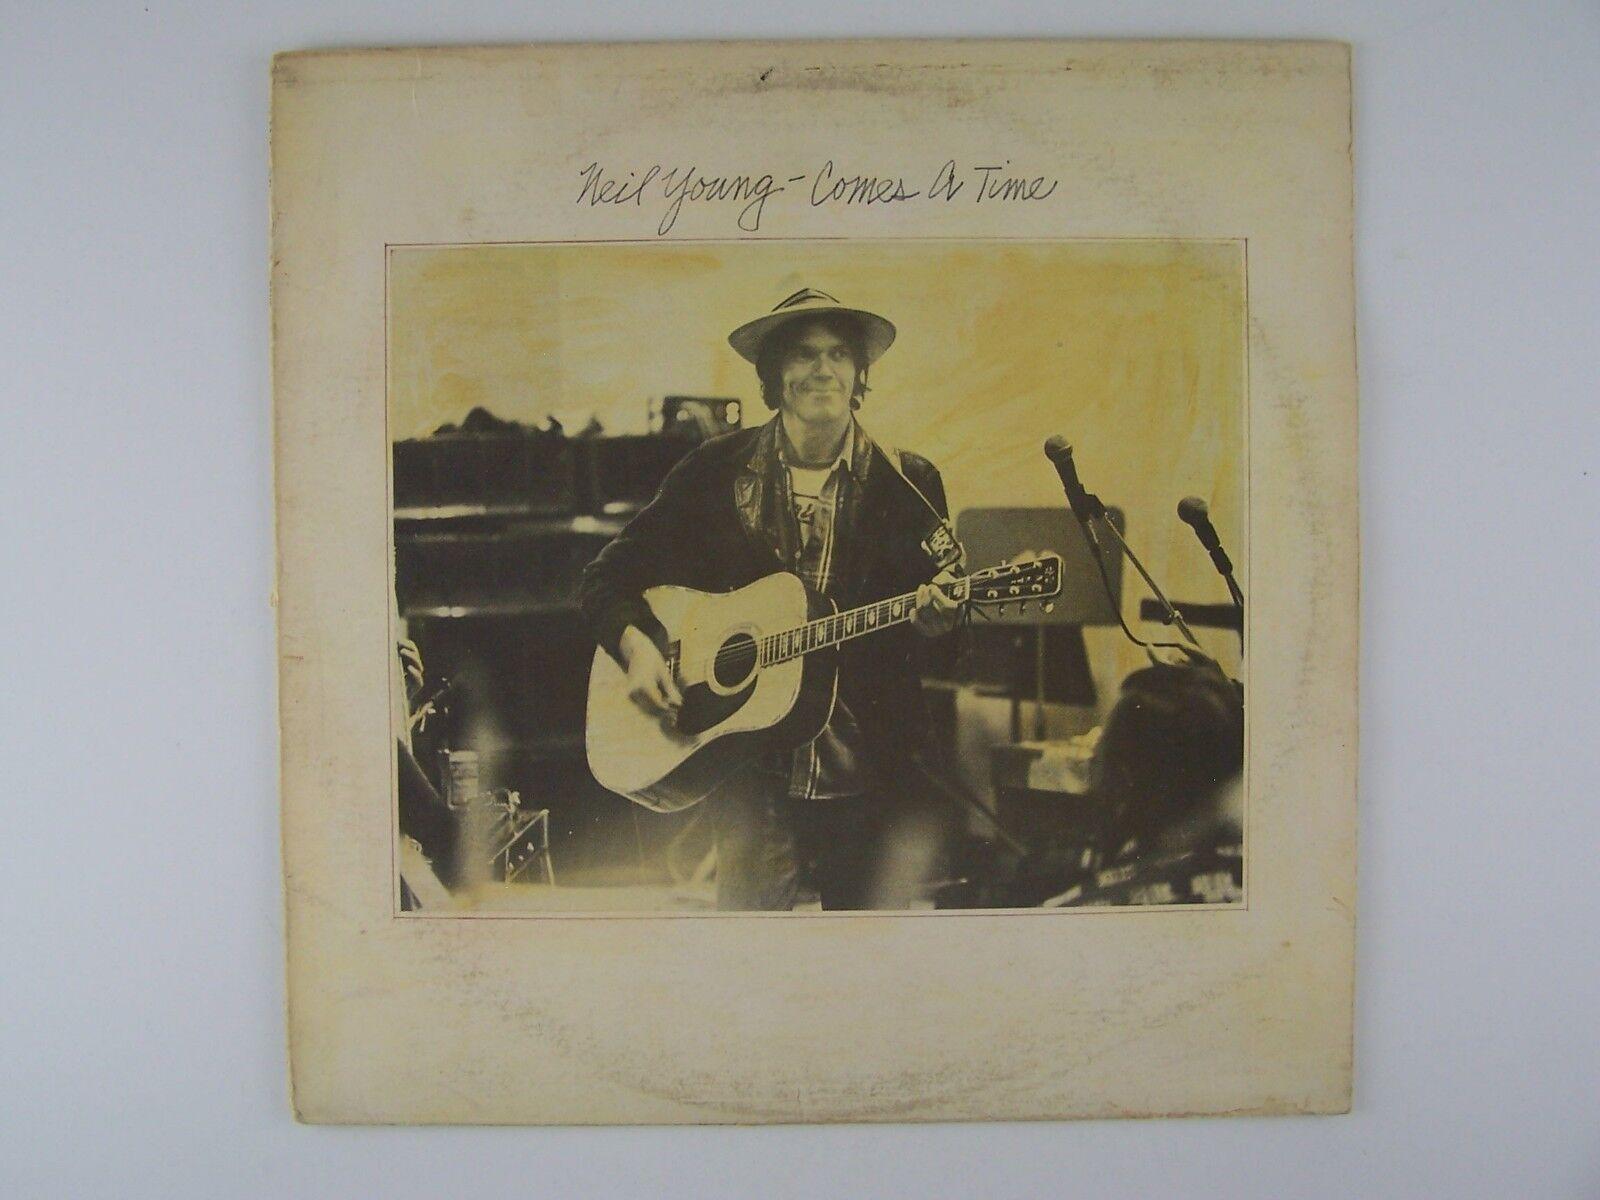 Neil Young - Comes A Time Vinyl LP Record Album MSK 226